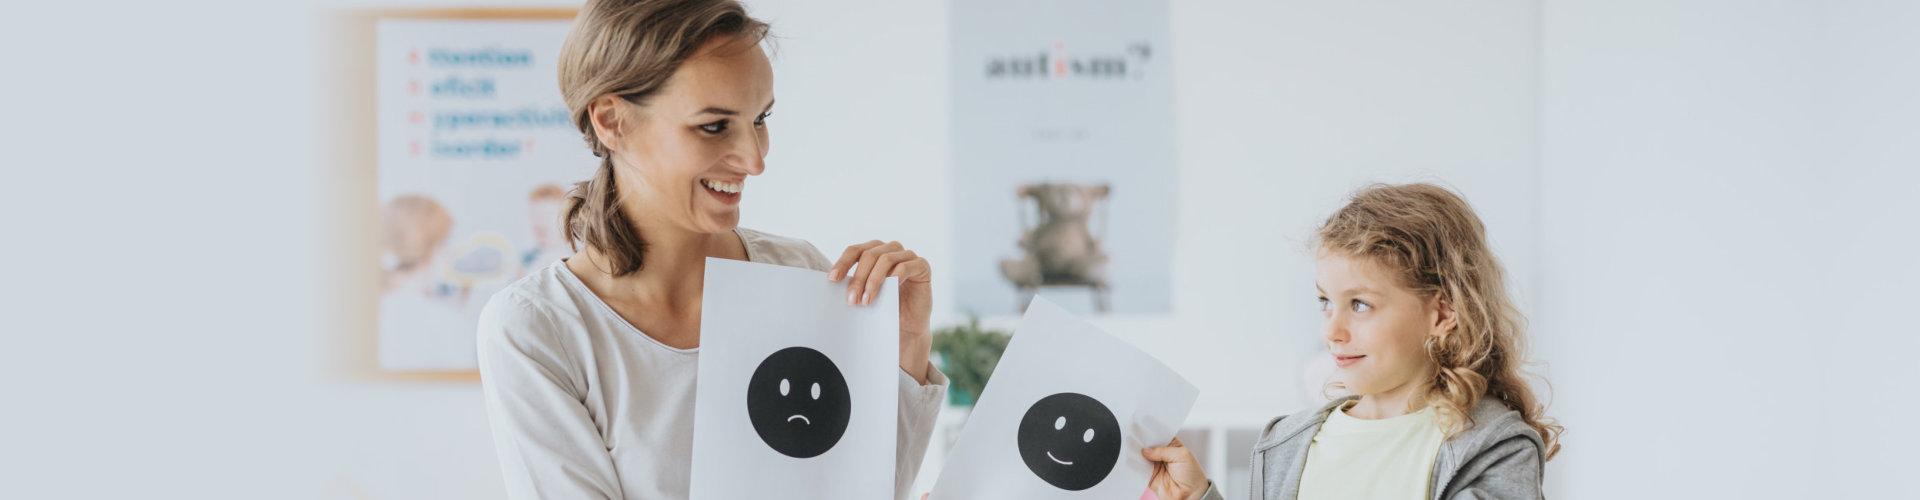 psychologist teaching child to communicate